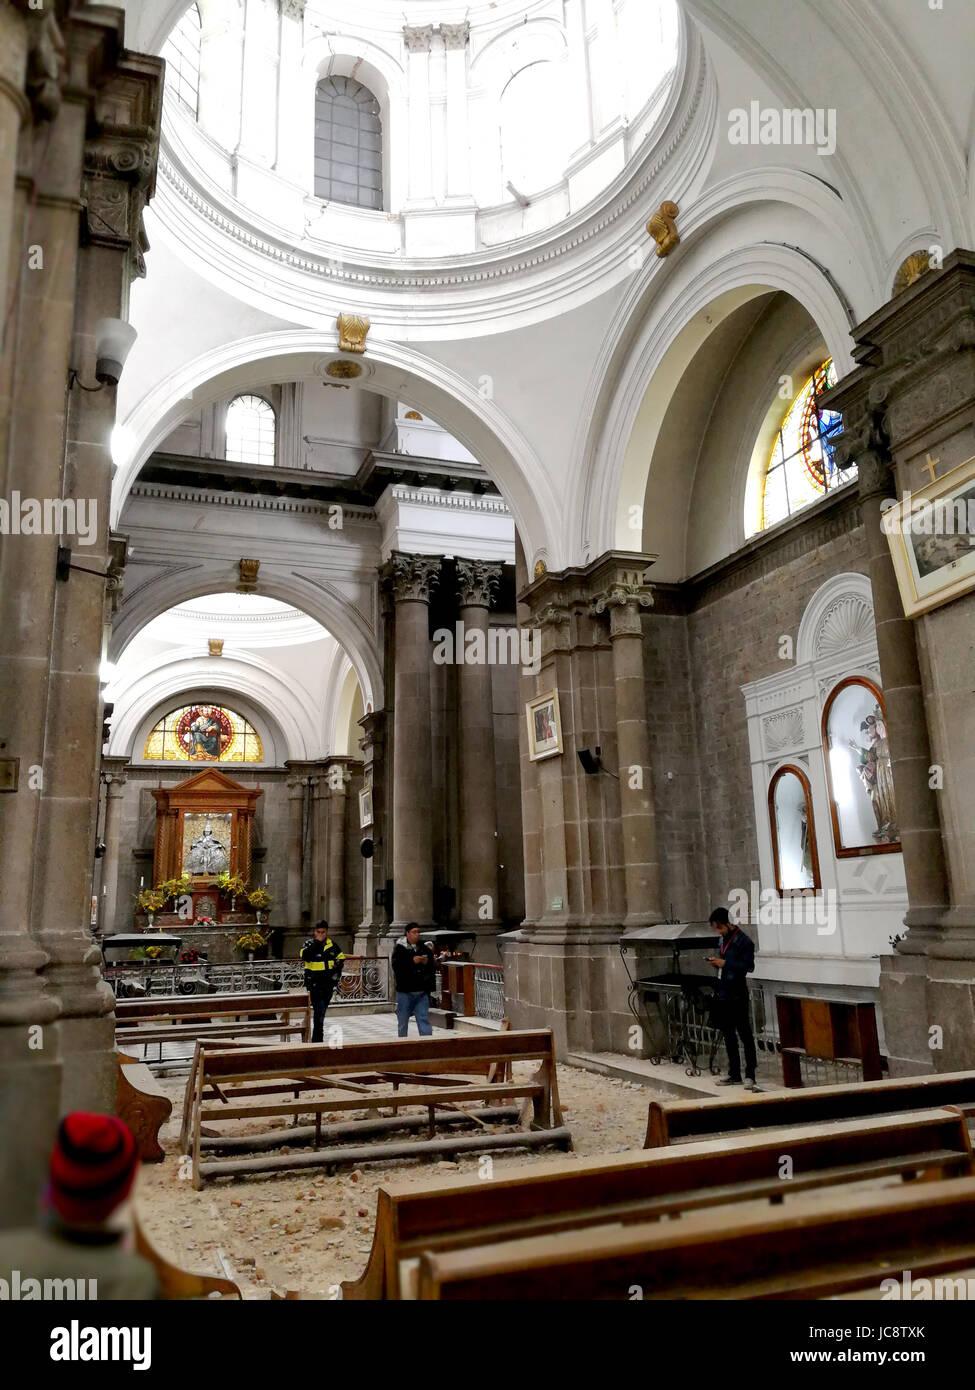 Quezaltenango, Guatemala. 14th June, 2017. The by an earthquake damaged Dome is pictured in Quezaltenango, Guatemala, - Stock Image